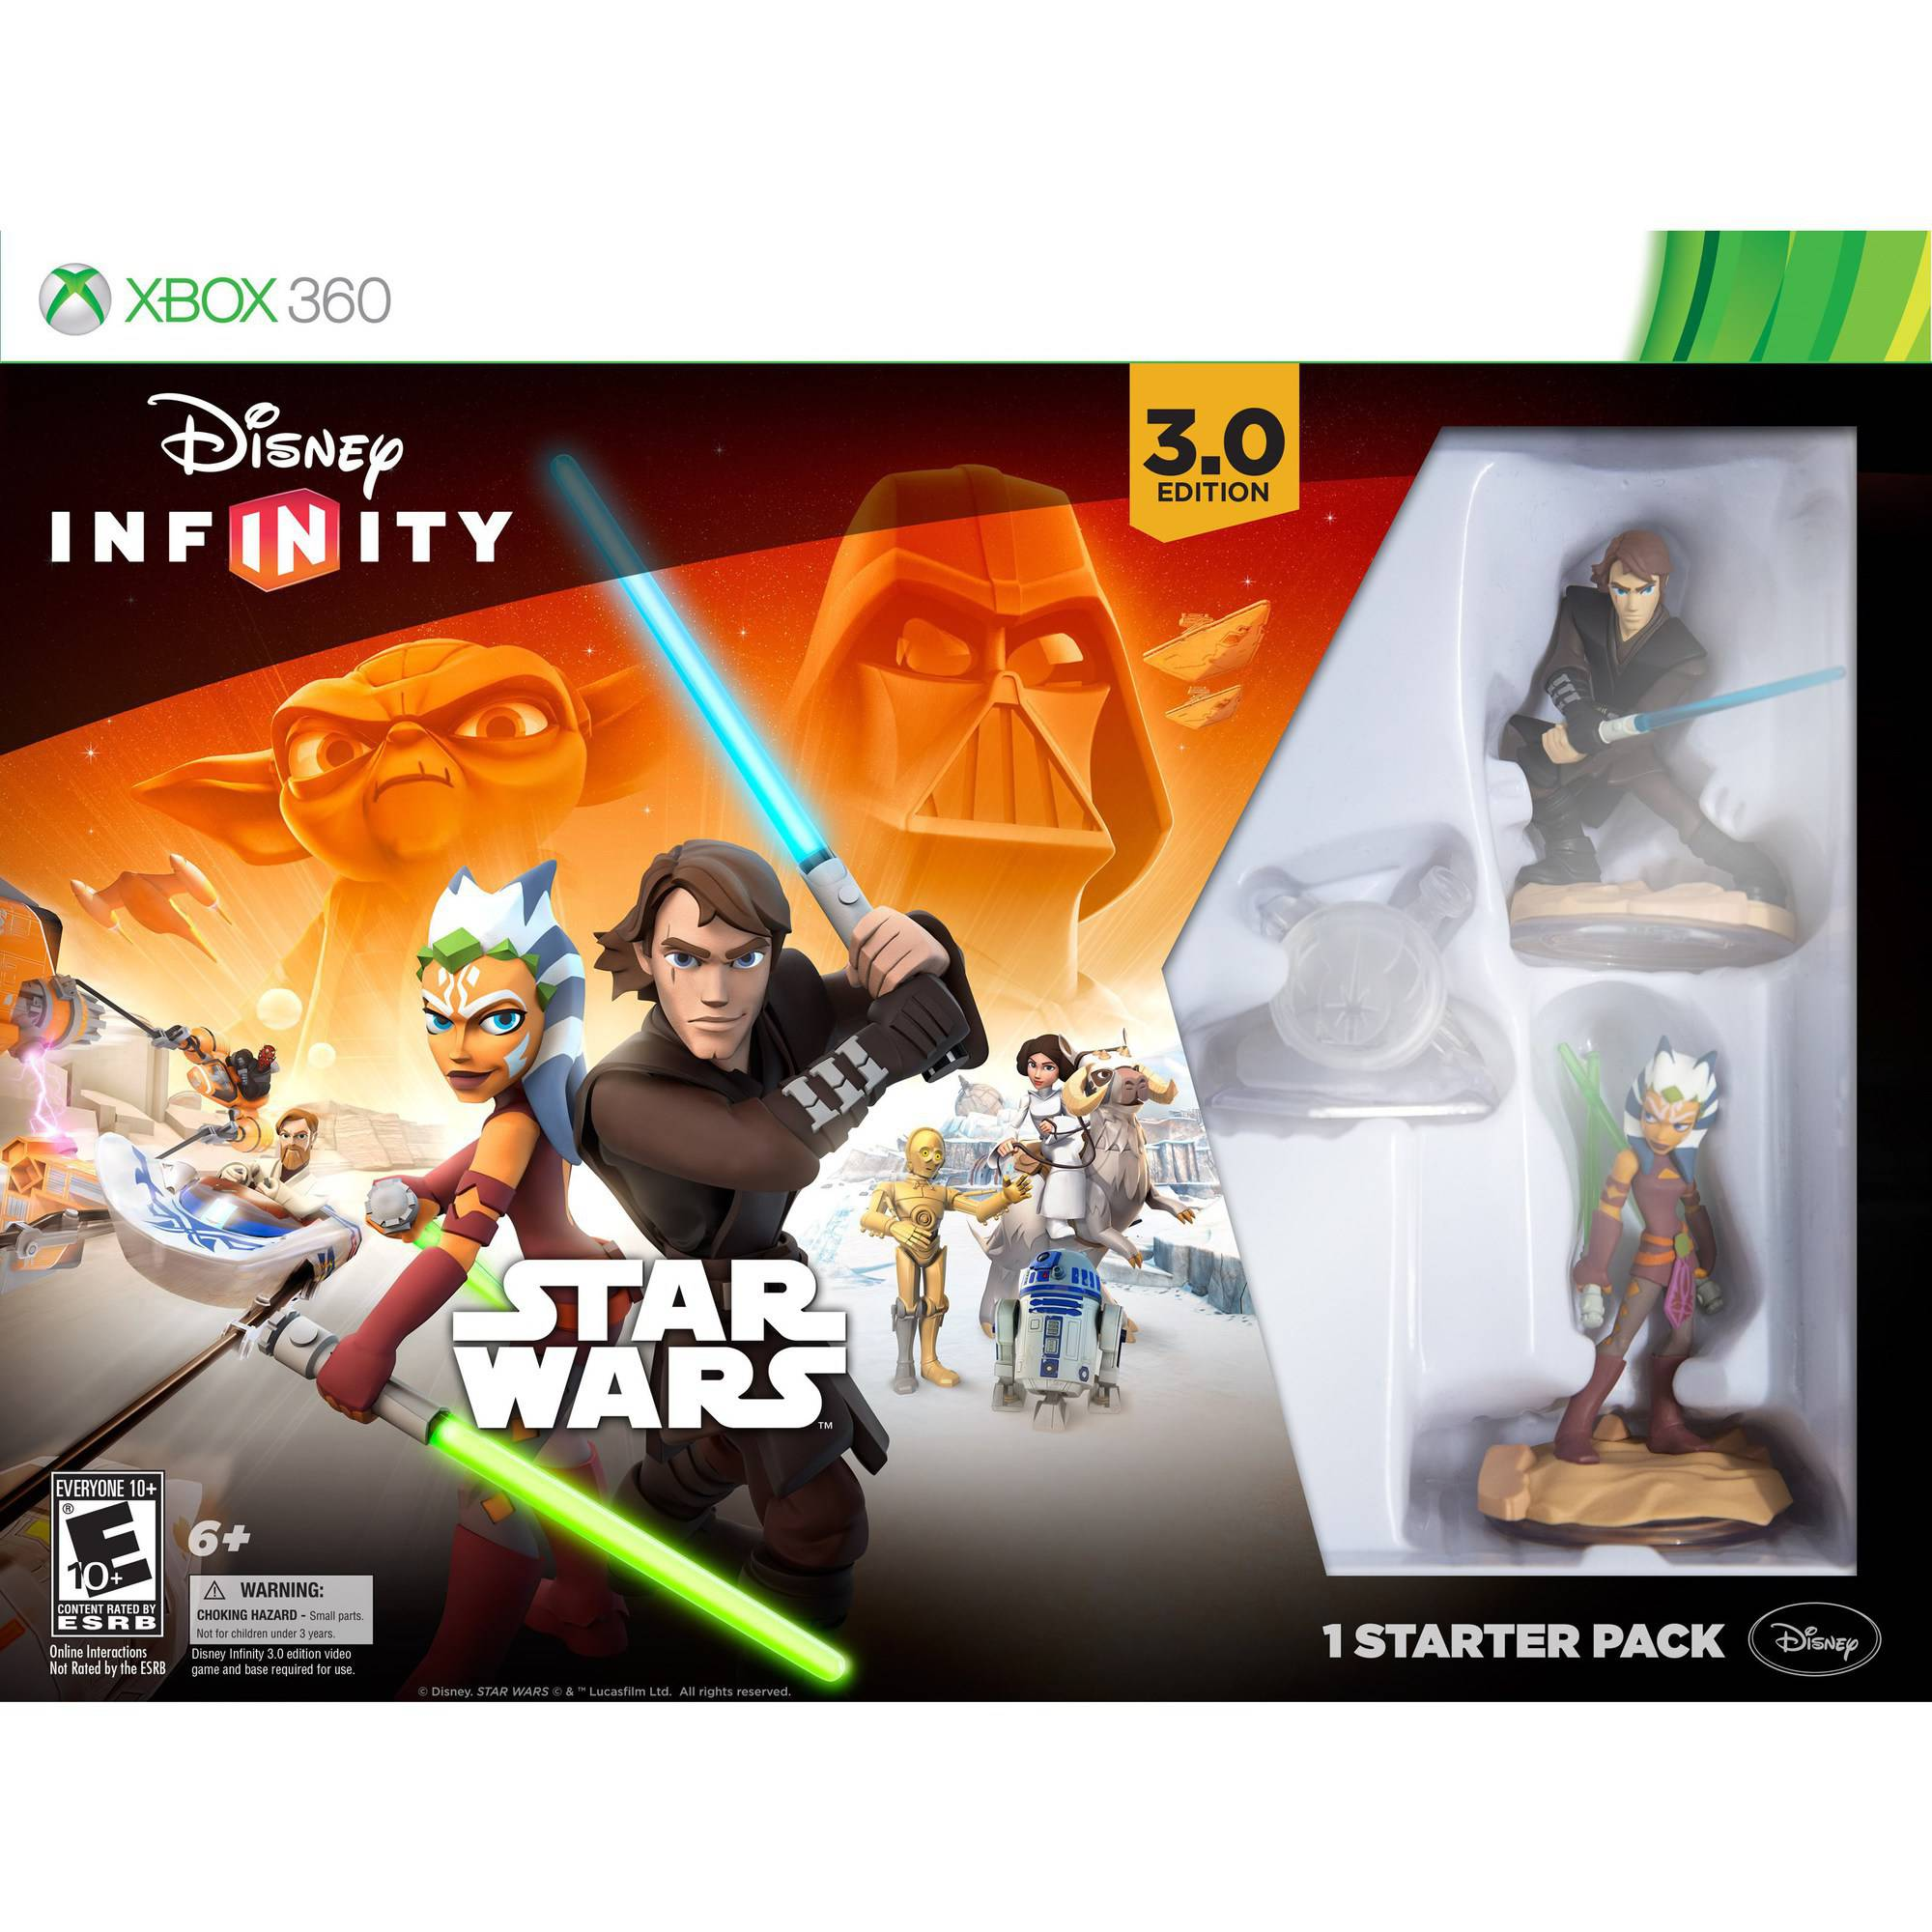 Star Wars Lego The Empire Strikes Out Dvd Walmartcom